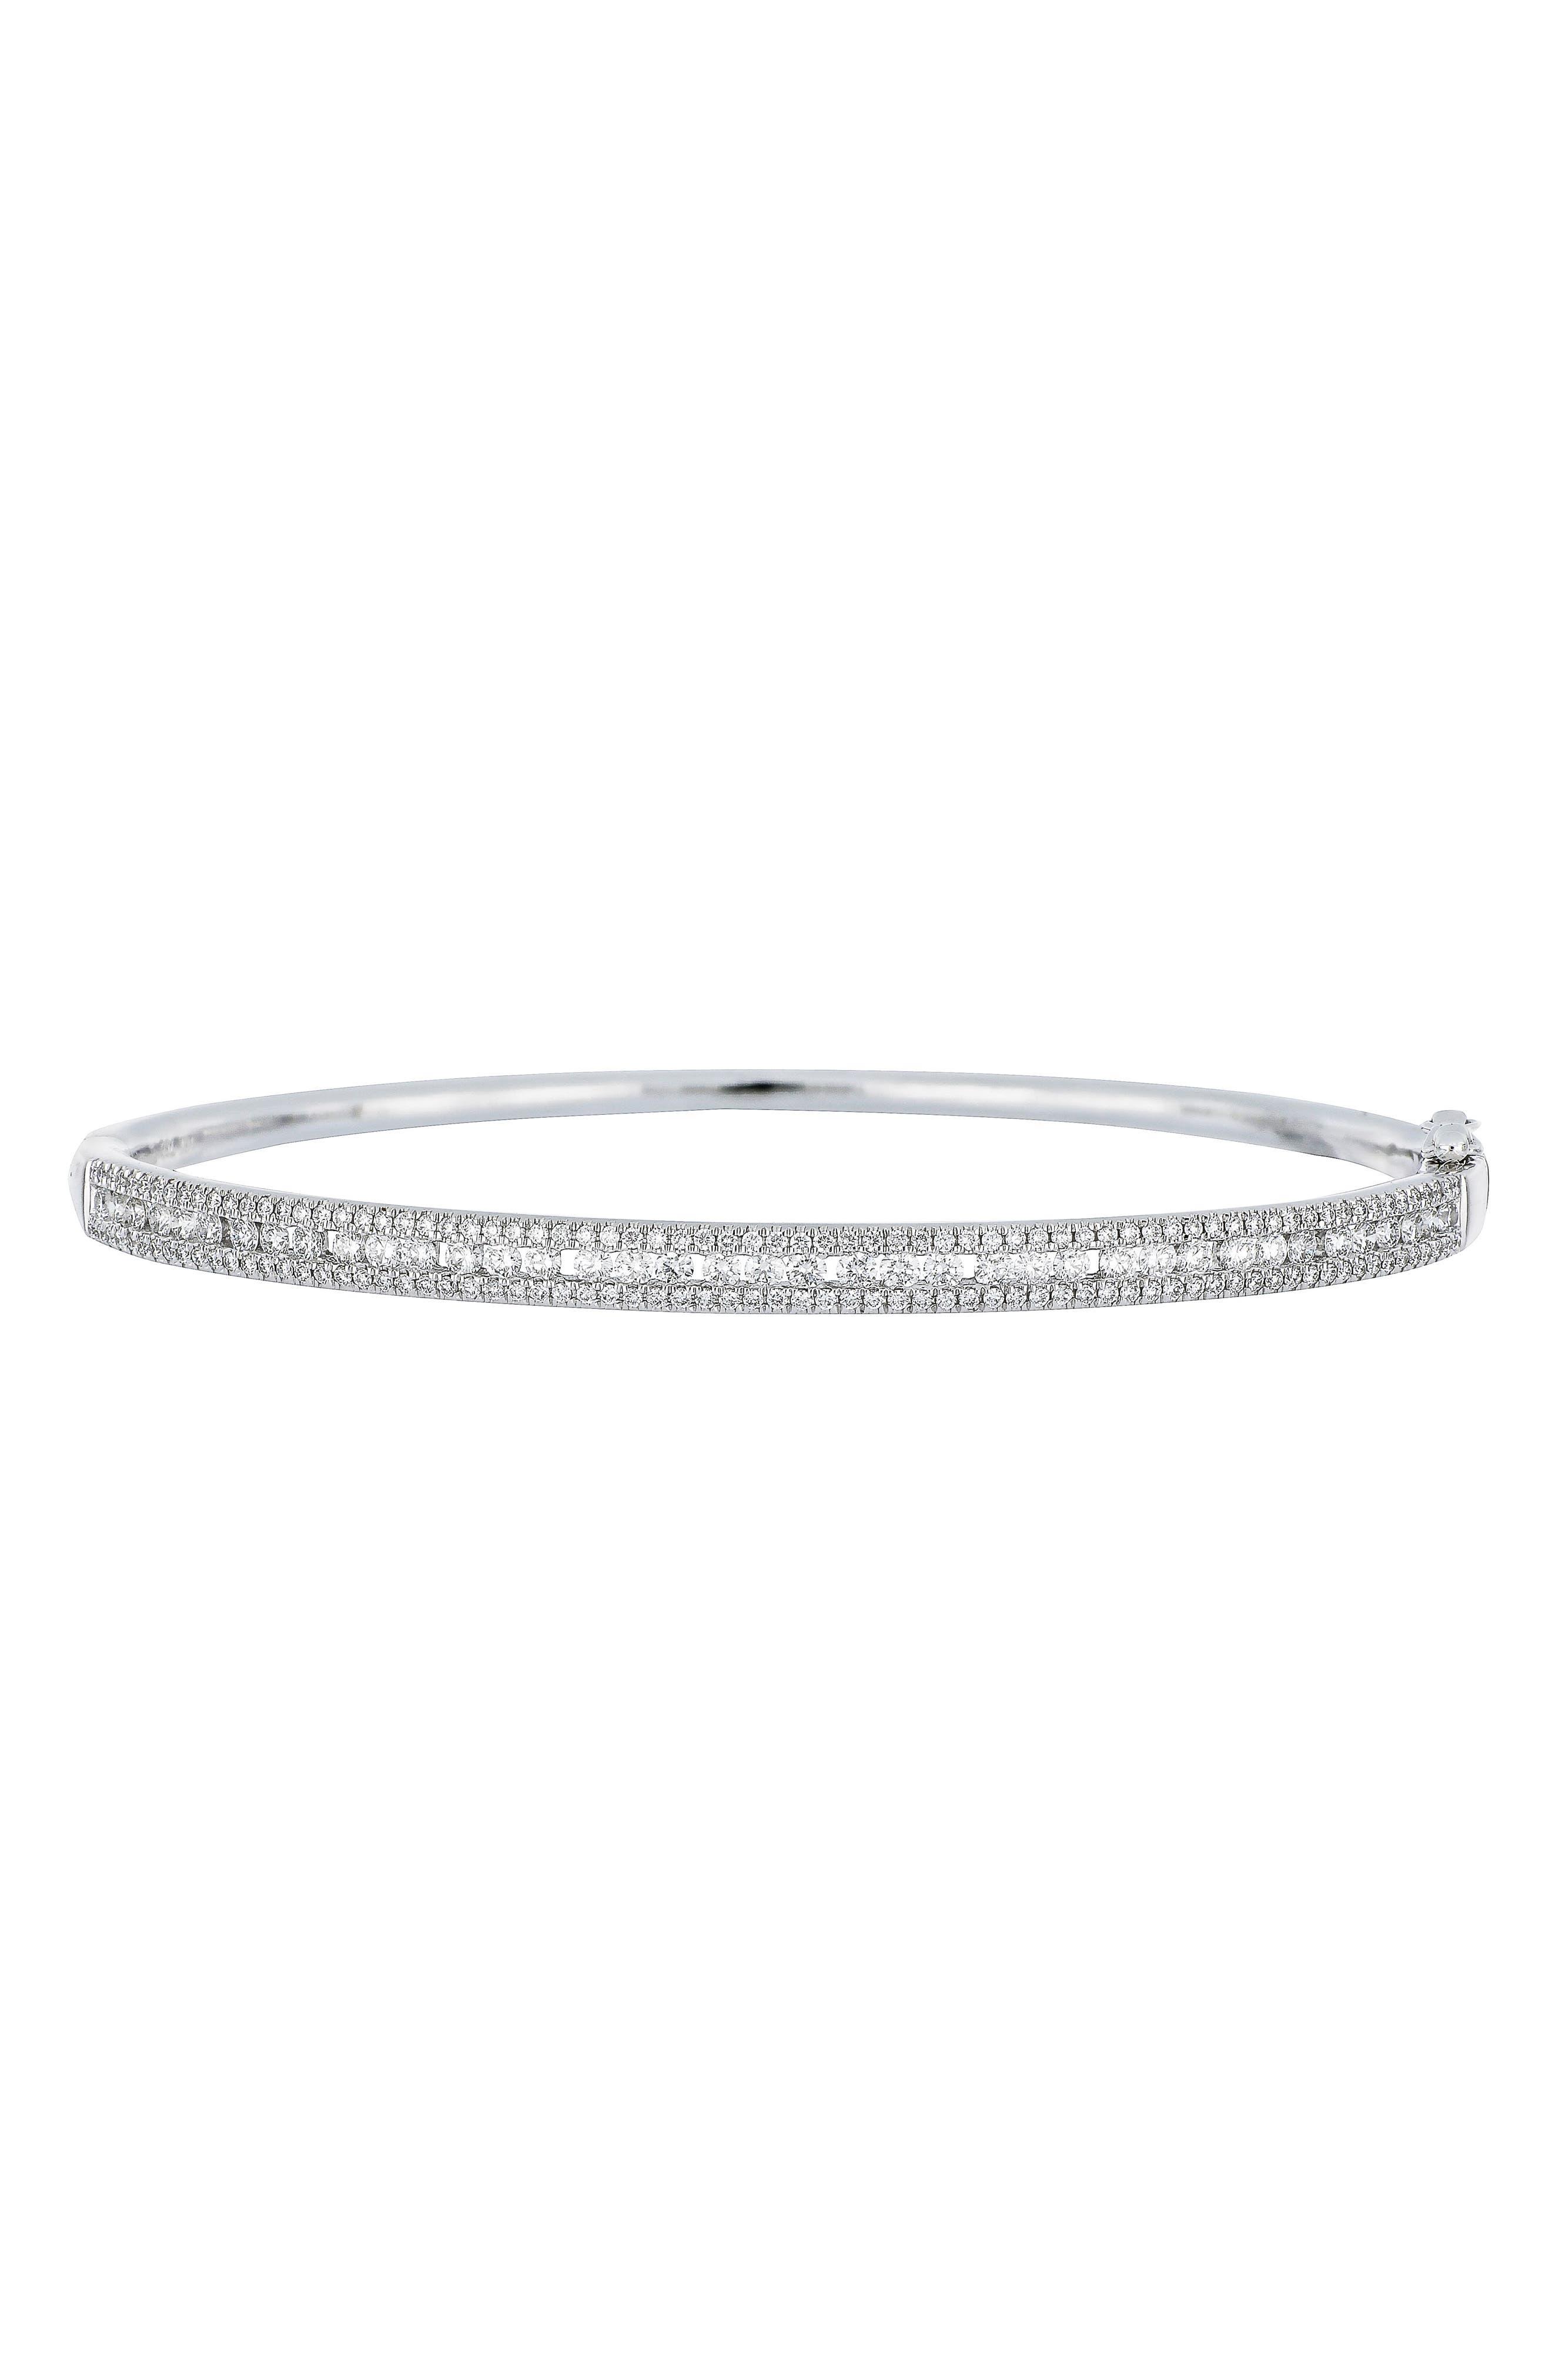 Alternate Image 1 Selected - Bony Levy Amara Diamond Bangle (Nordstrom Exclusive)